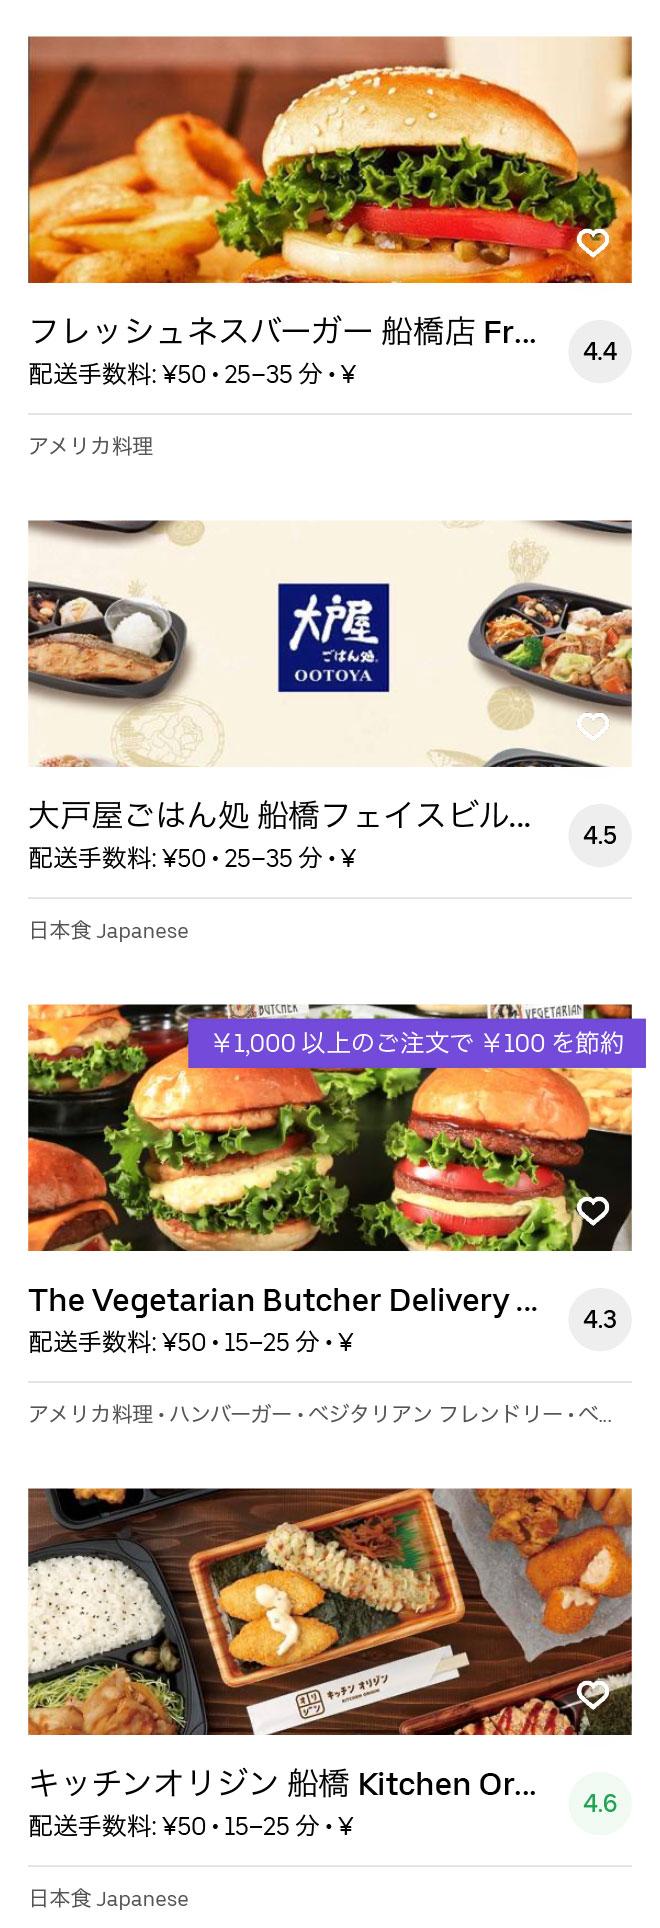 Funabashi menu 2004 04